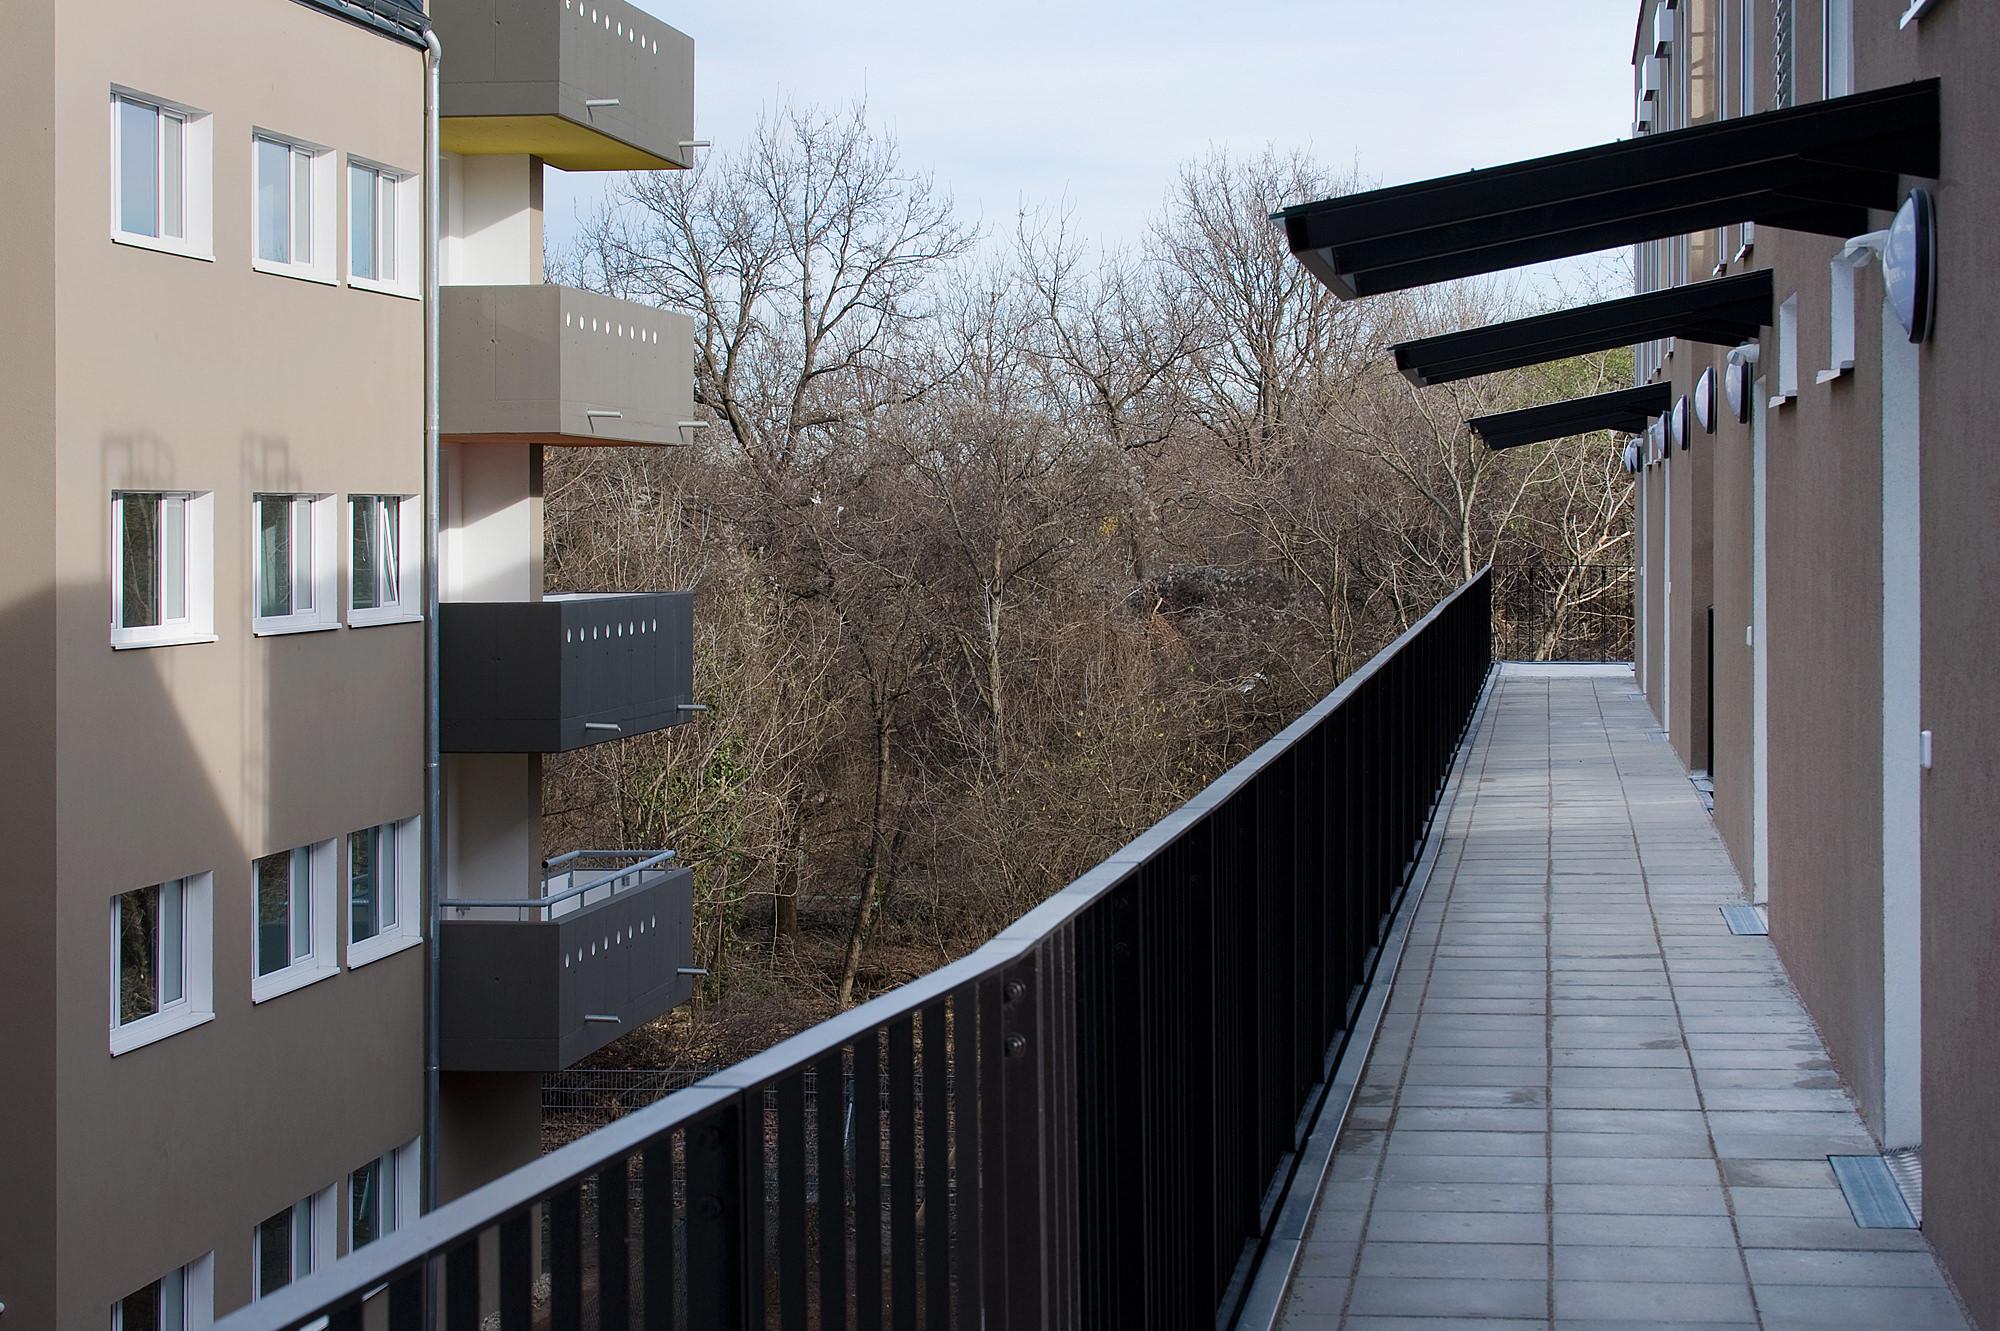 moselgasse_02_wohnbau_1100_wien_junger_beer_architektur